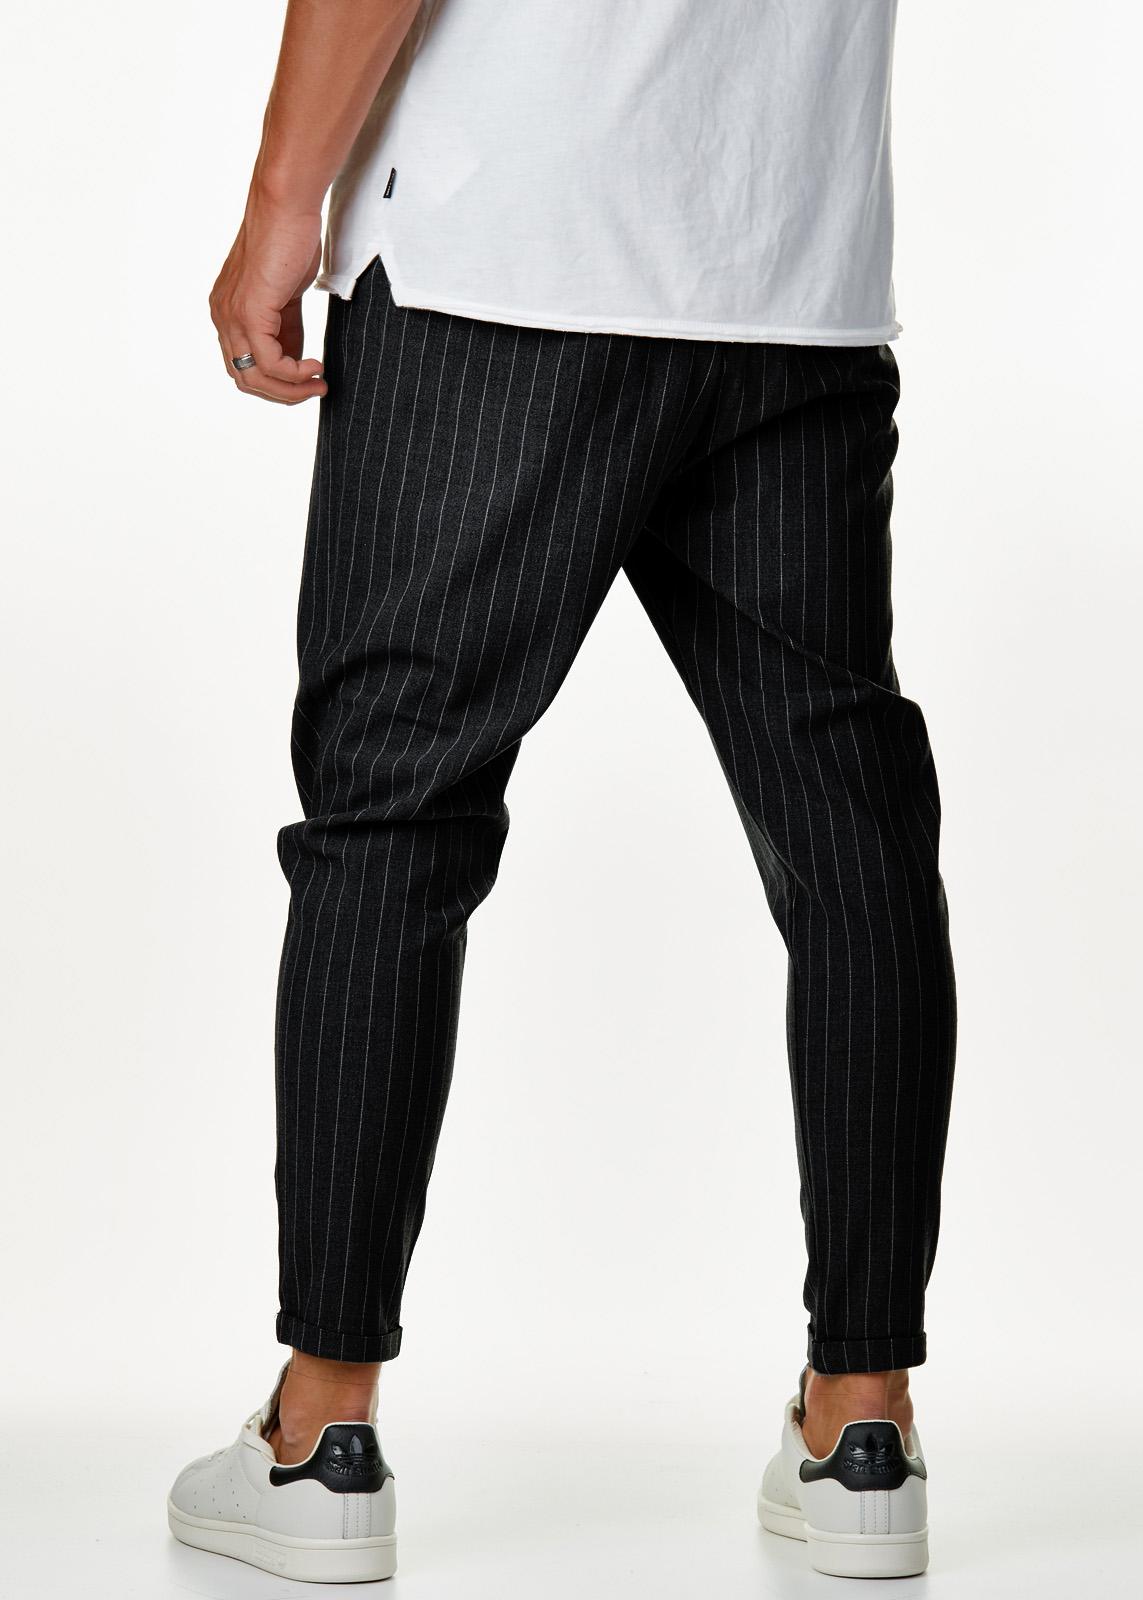 eightyfive herren stoffhose jogging pants 7 8